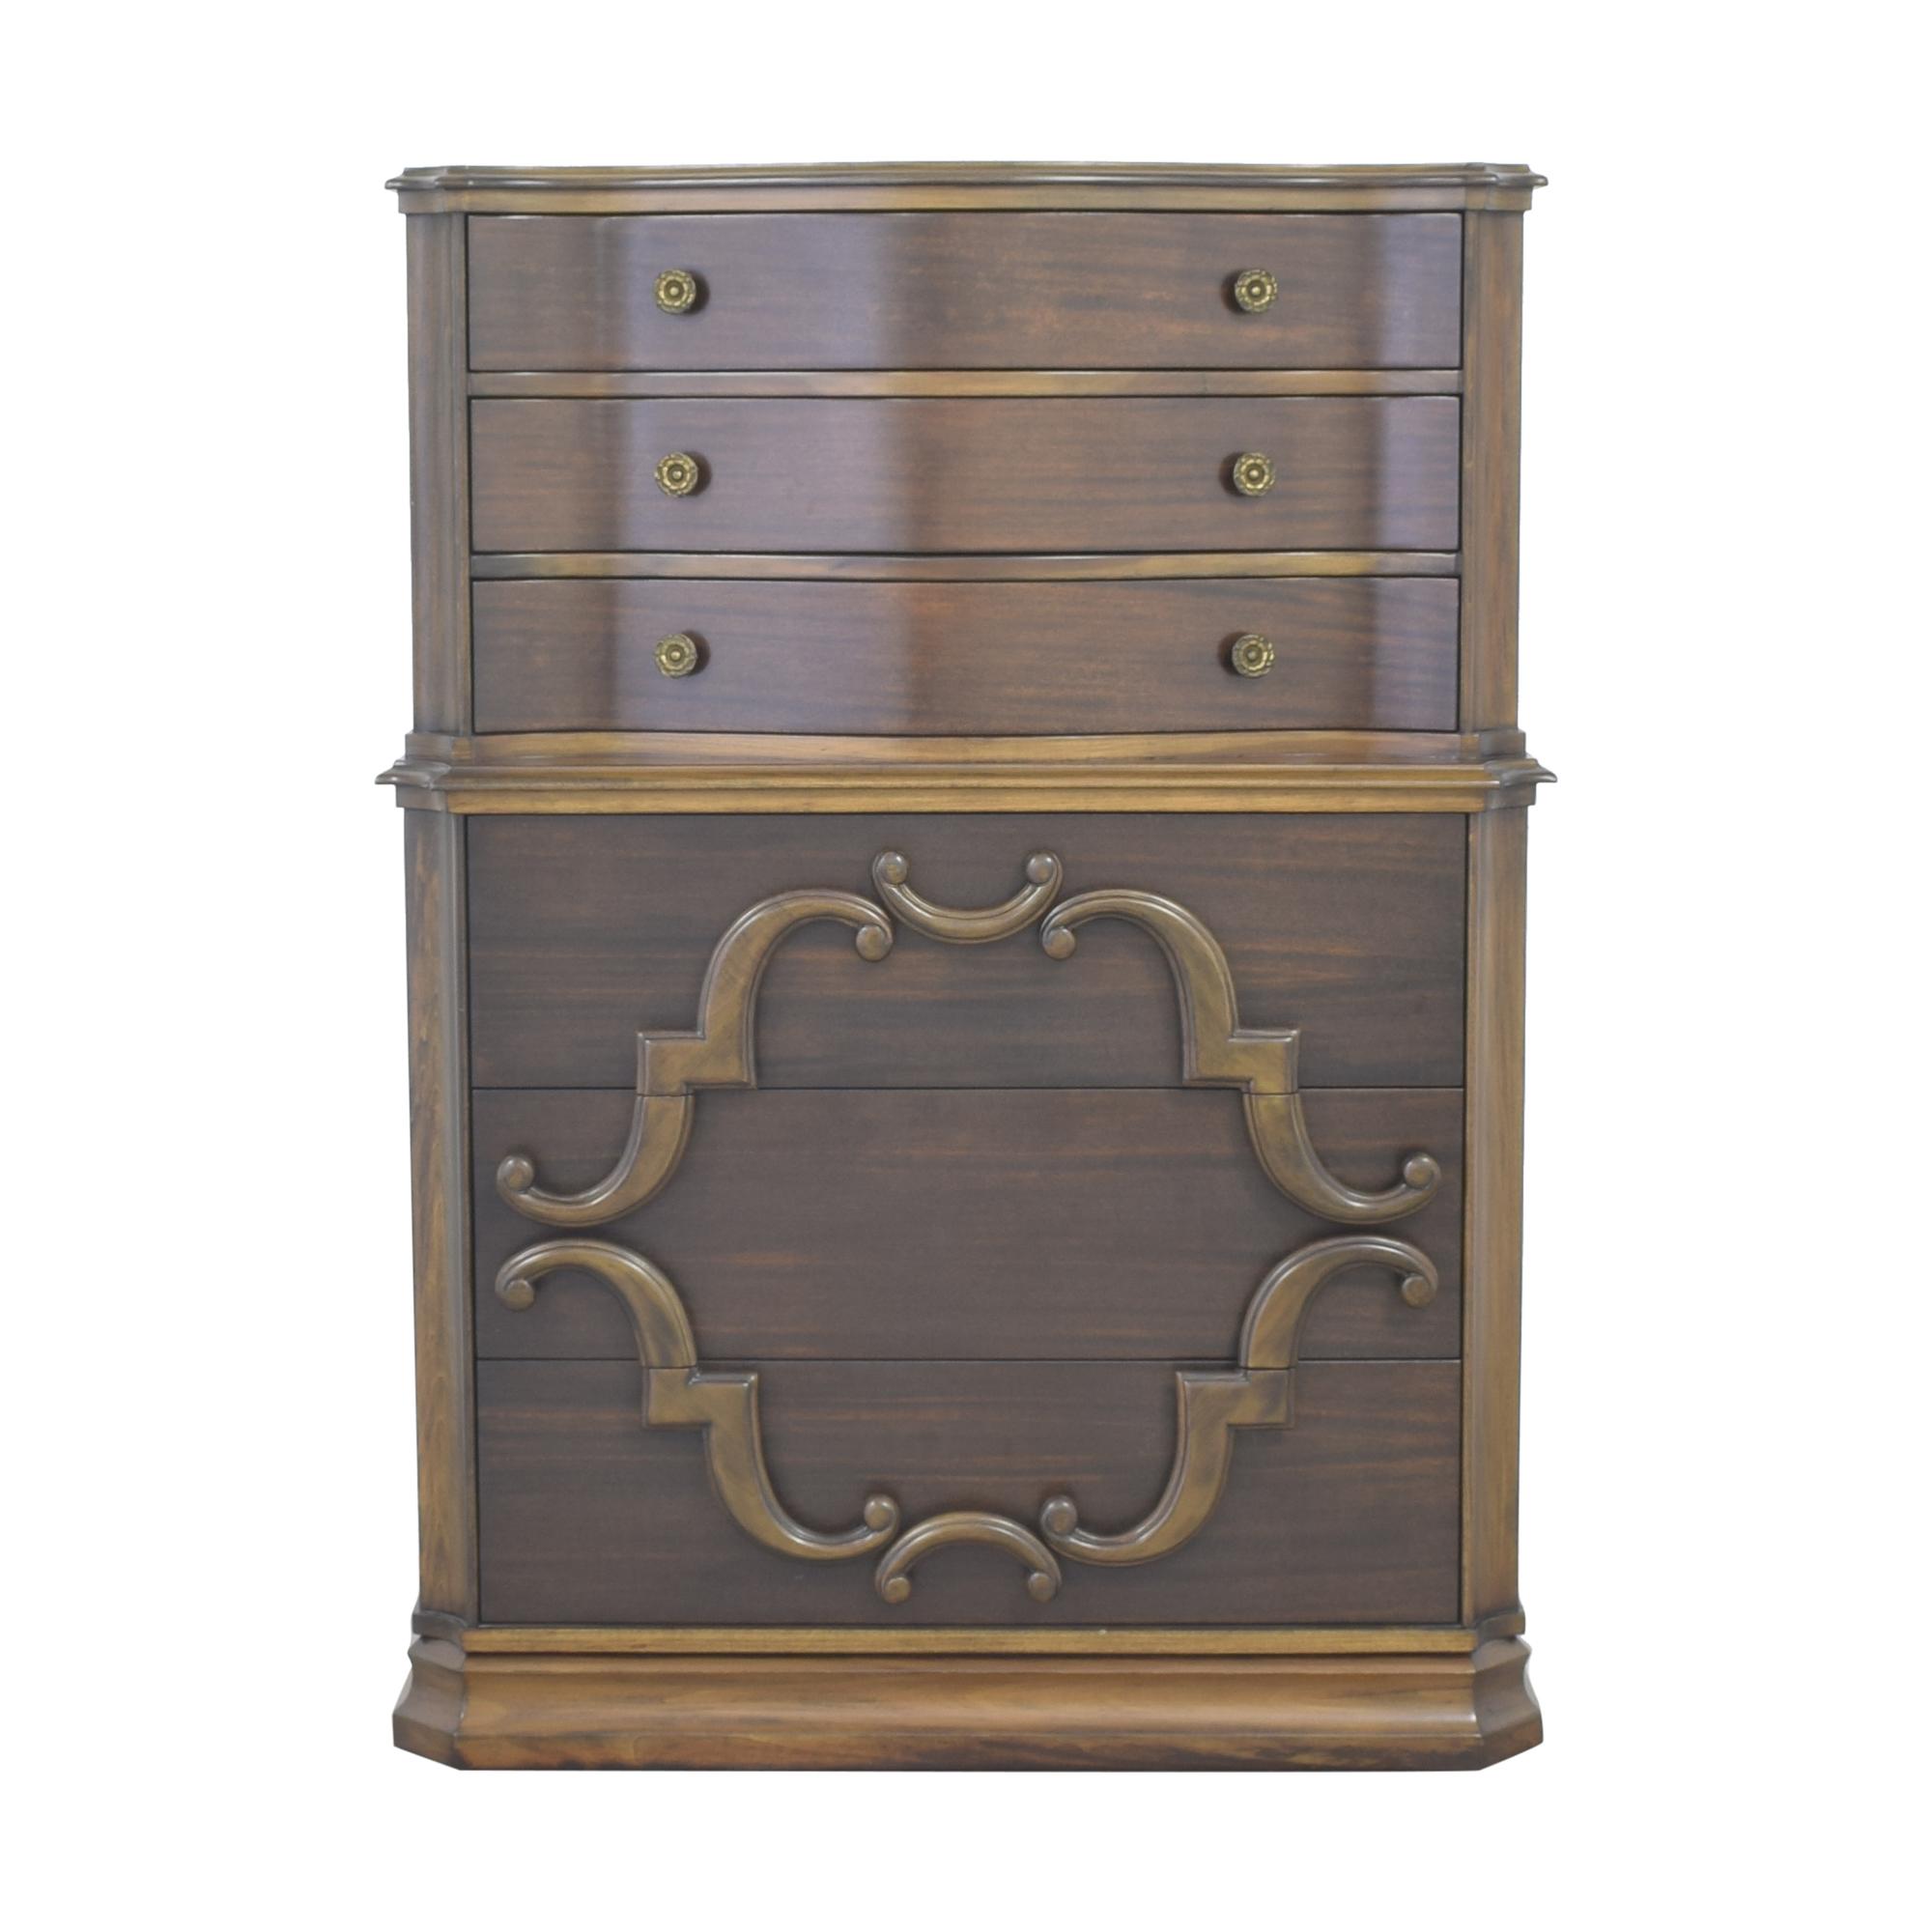 Upright Six Drawer Dresser second hand